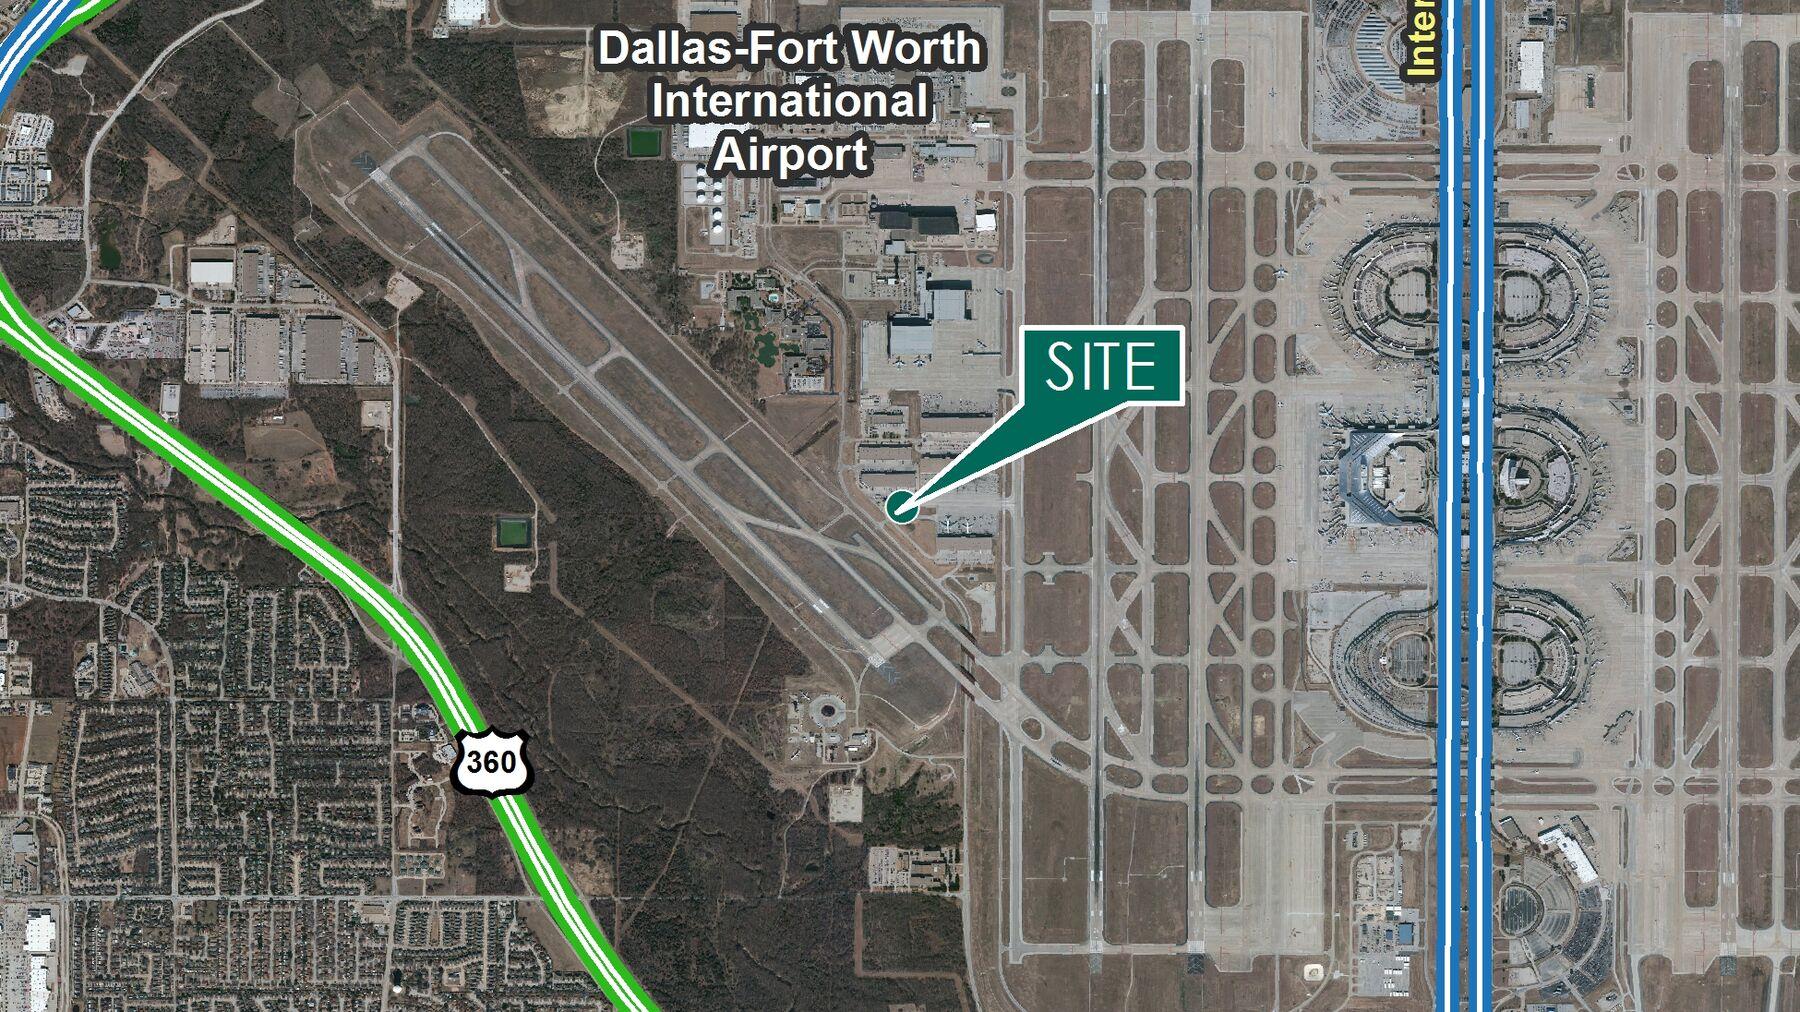 DPM-Prologis-DFW-8-DAL09308-2460-W-Airfield-Drive_AerialMap.jpg